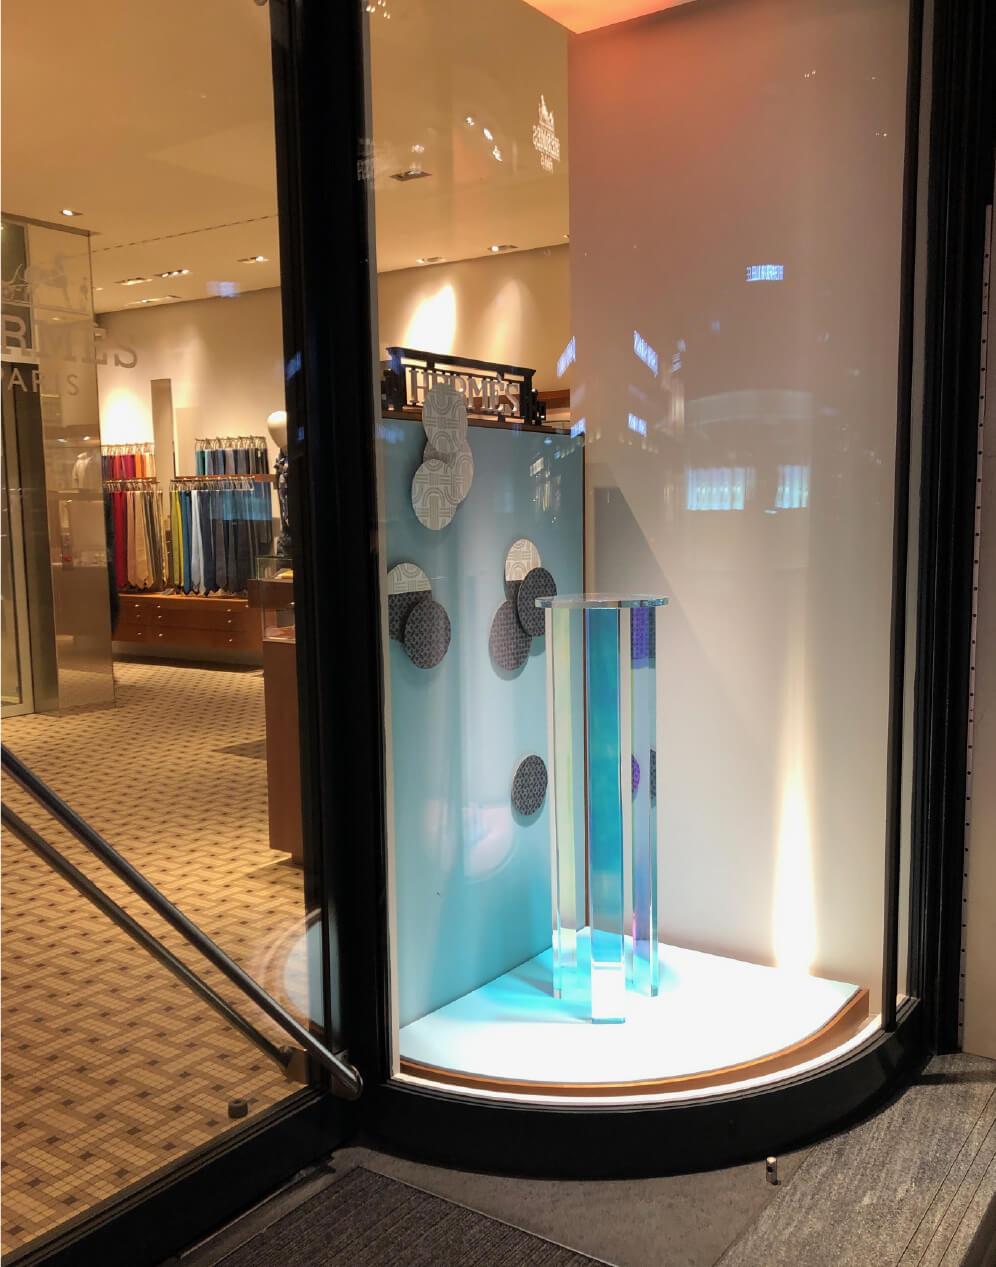 hermes-suisse-window-vitrine-mersh-scenographie-decor-display-retail-luxe-OKTO-_04